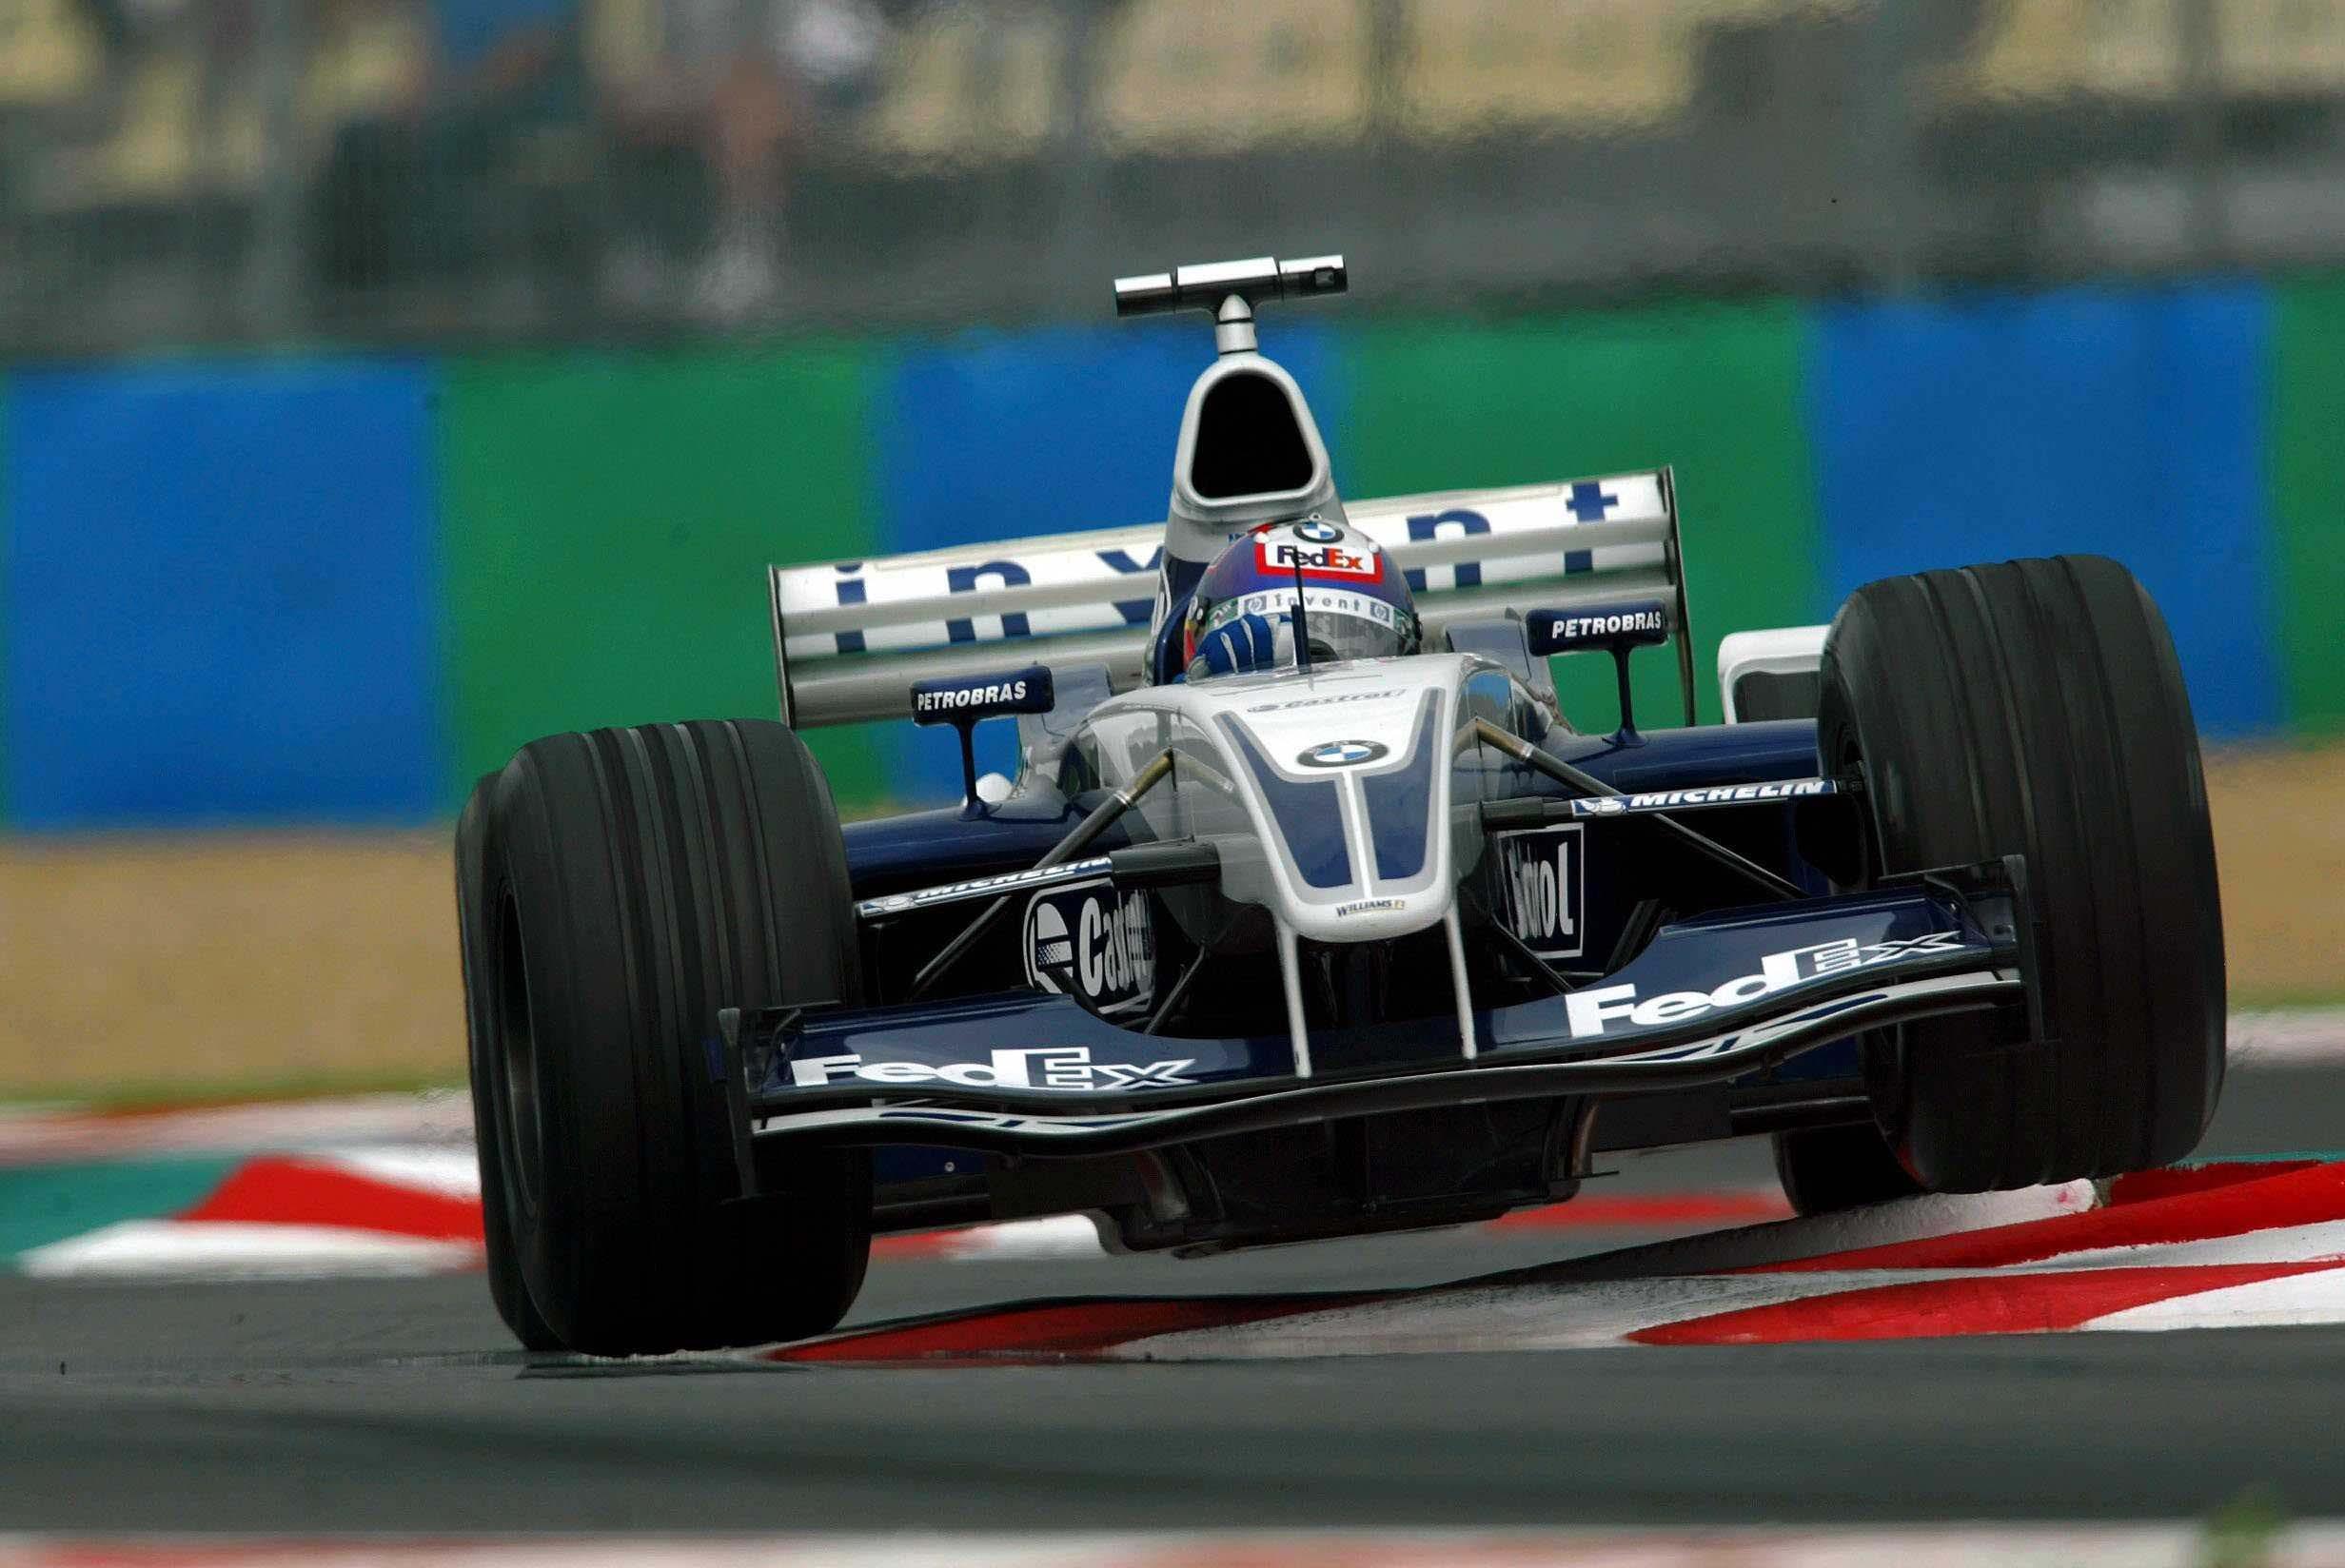 Juan Pablo Montoya 2003 Williams FW25